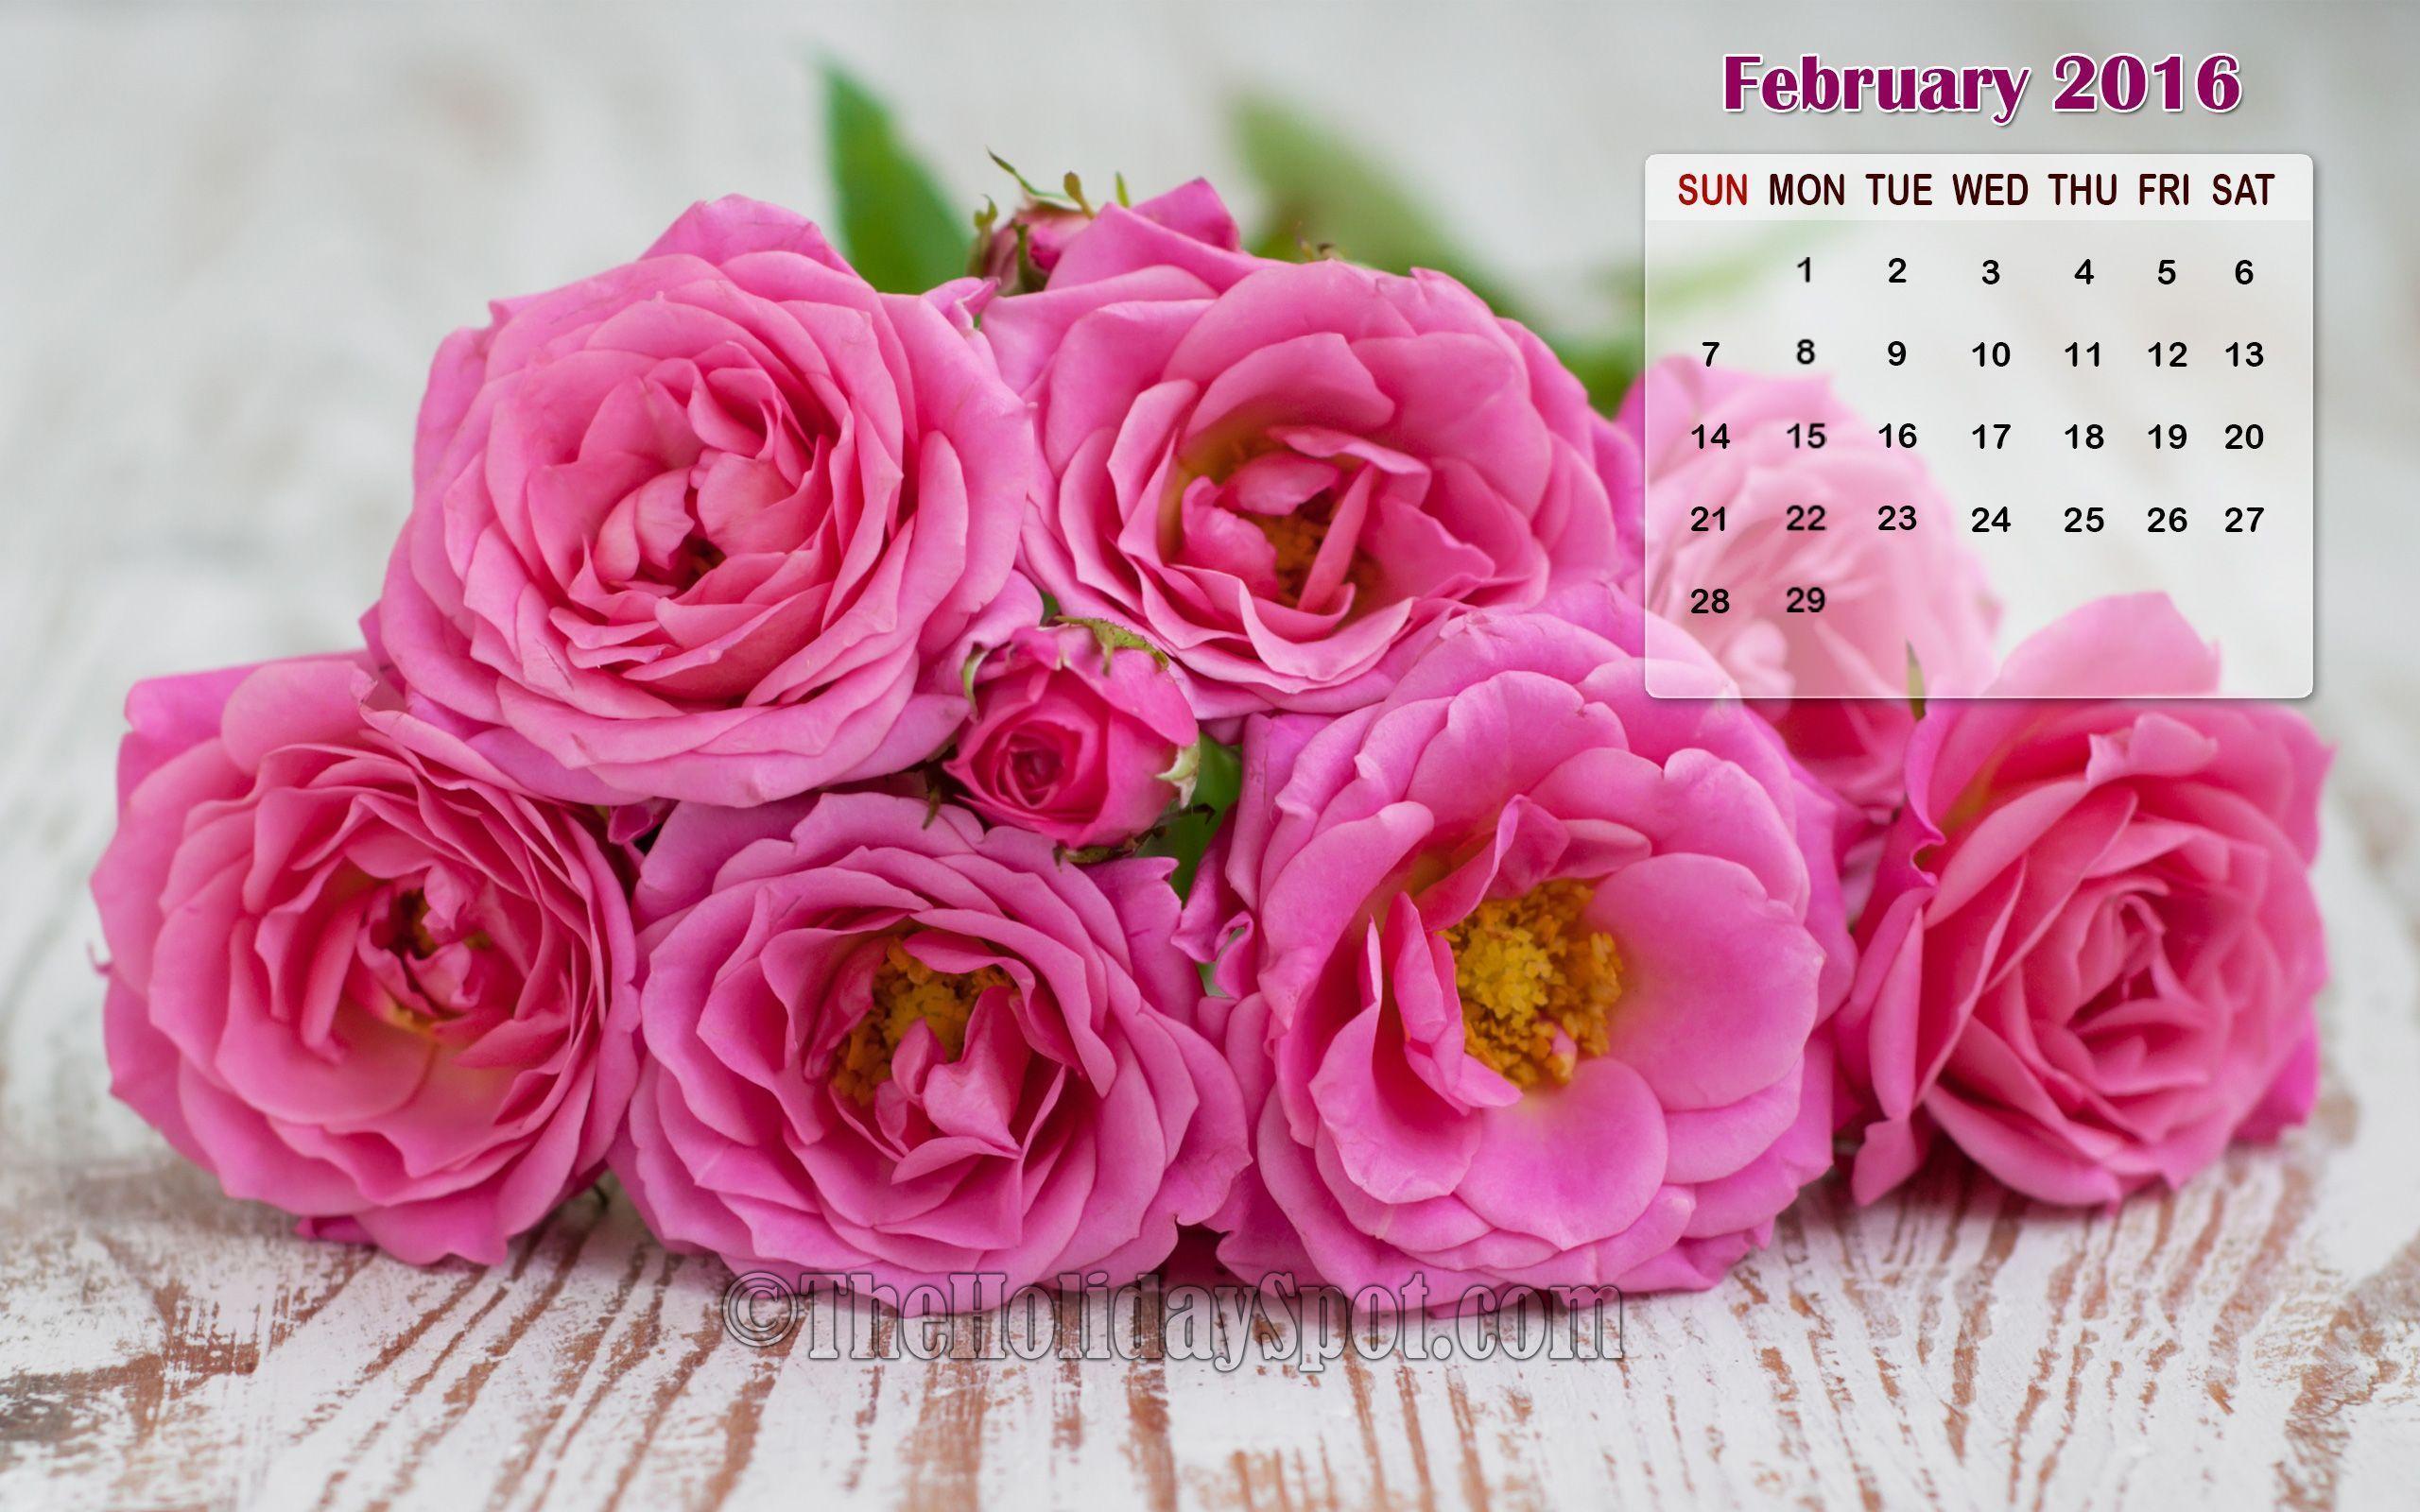 ... Backgrounds Desktop wallpapers calendar february 2016 - wallpaper cave